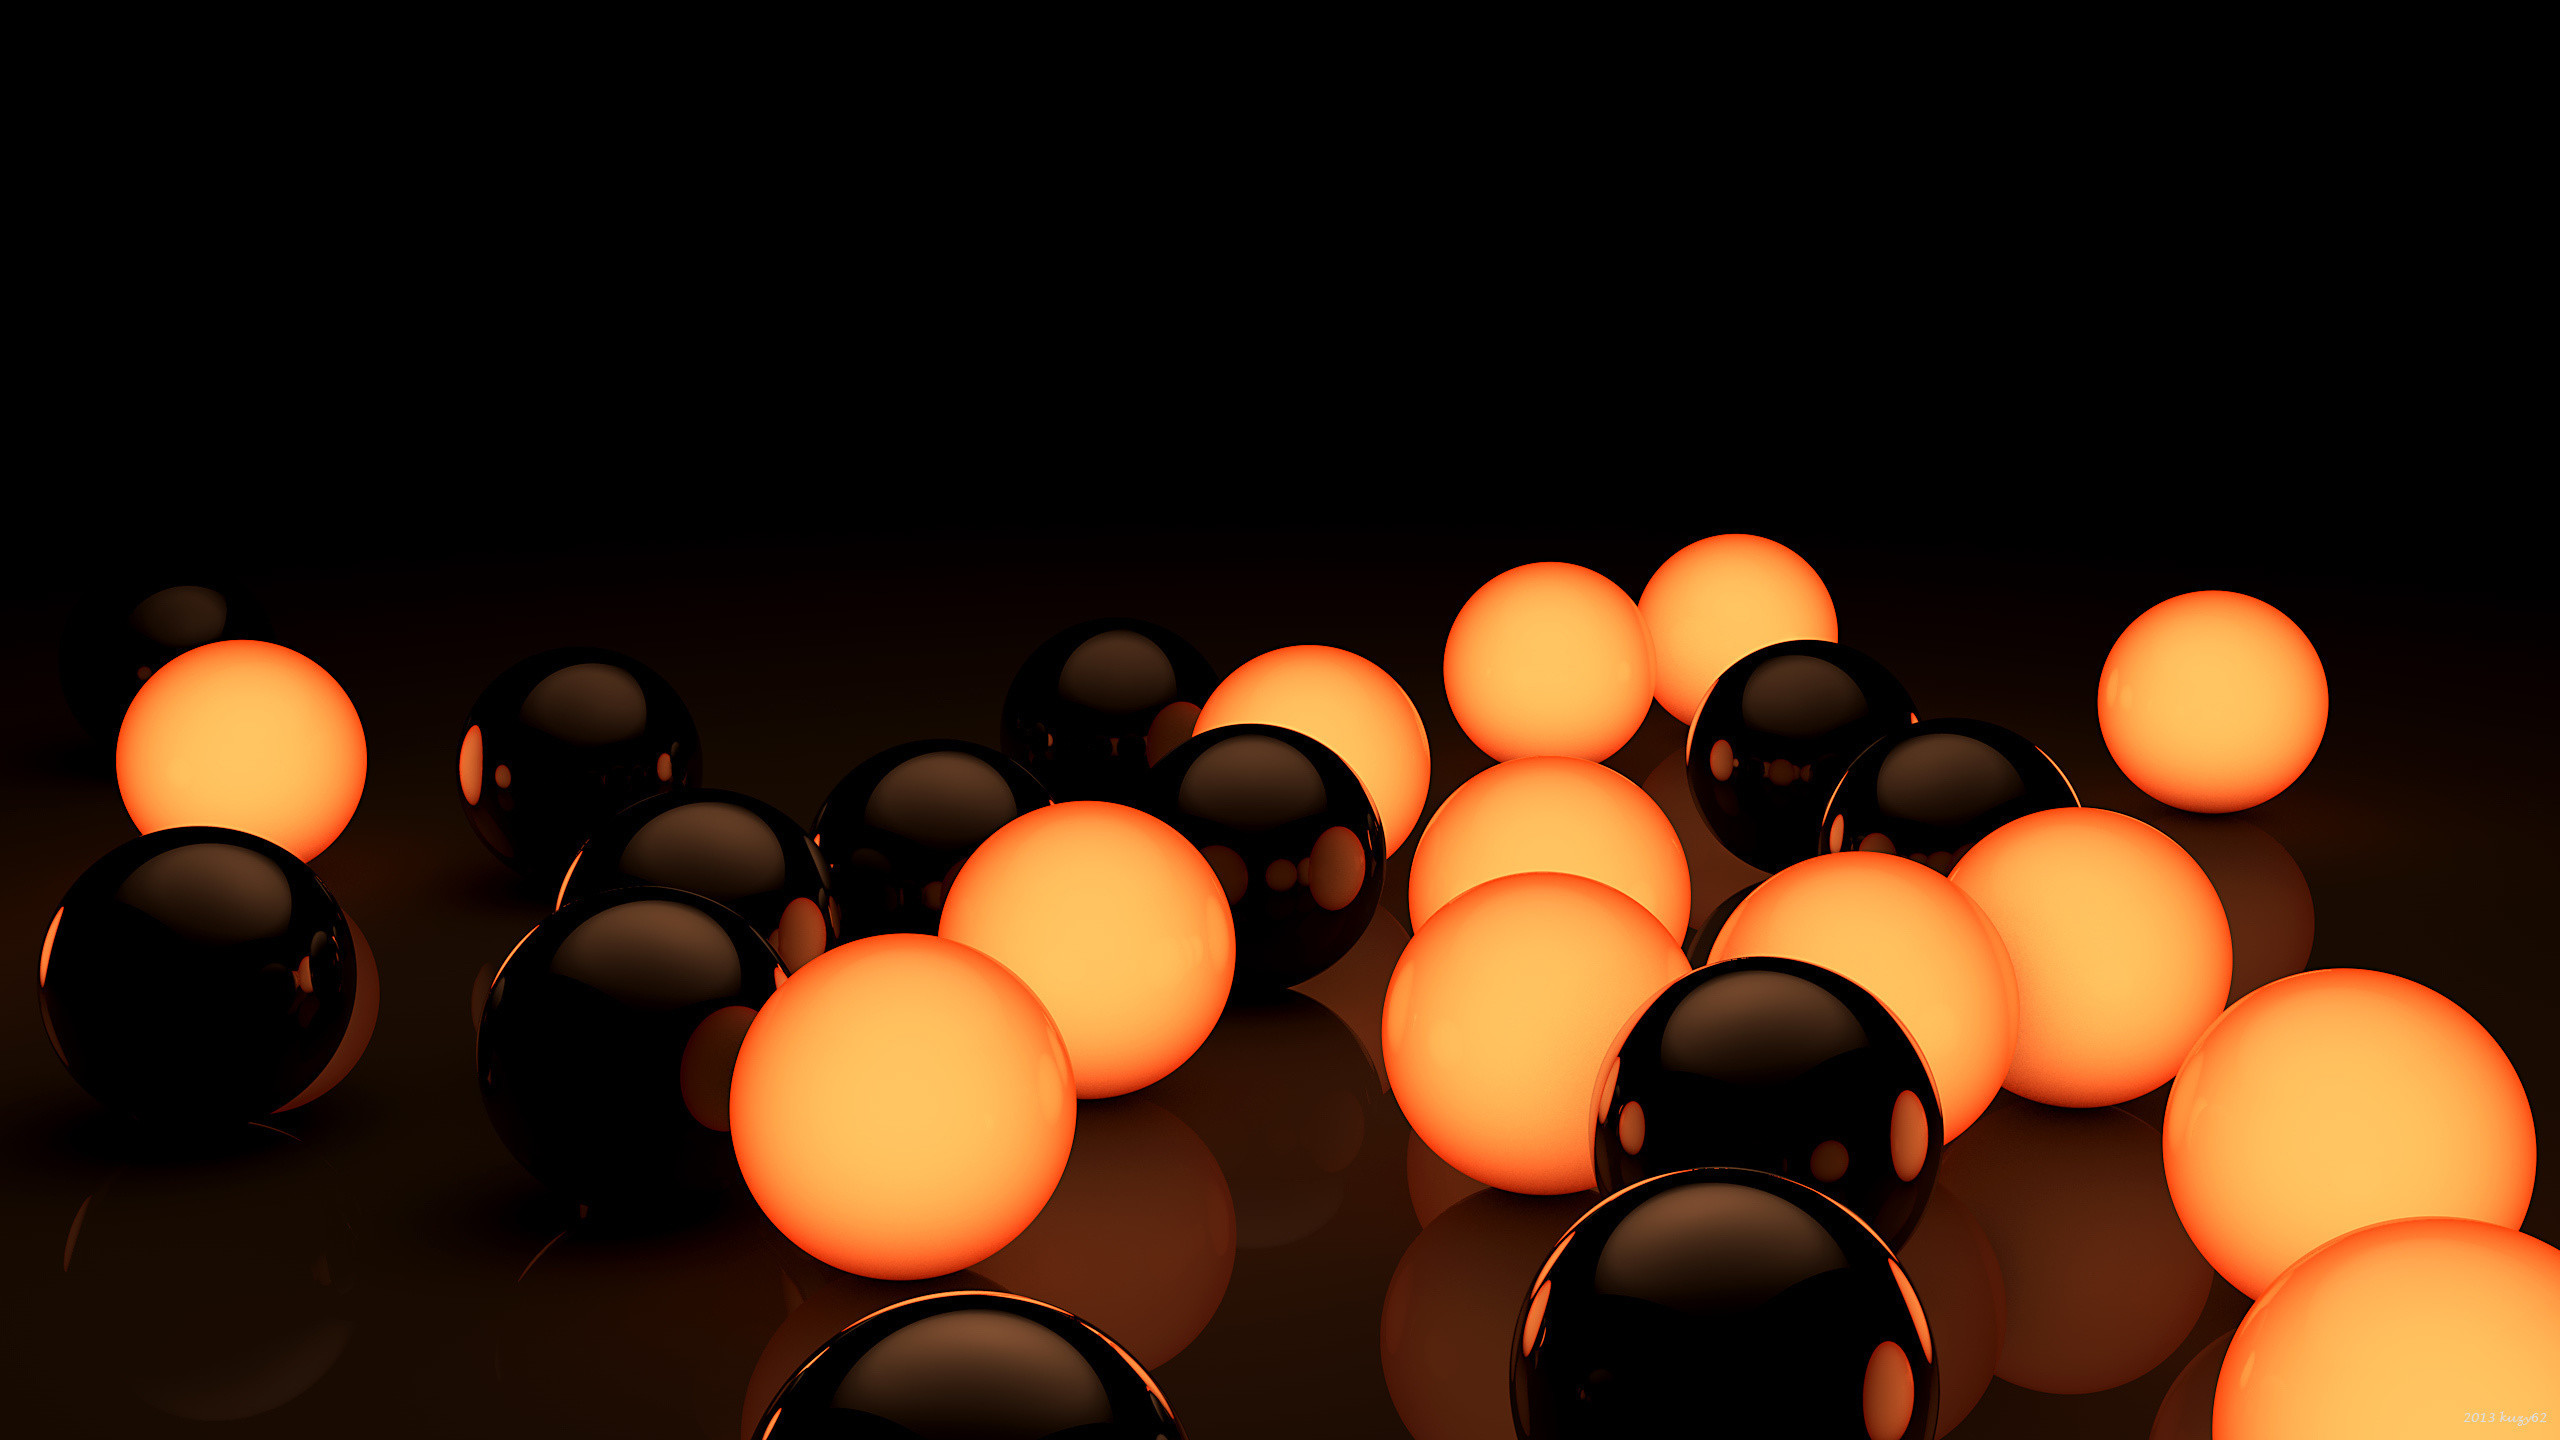 Black and Orange Bubbles in Wallpaper 3D